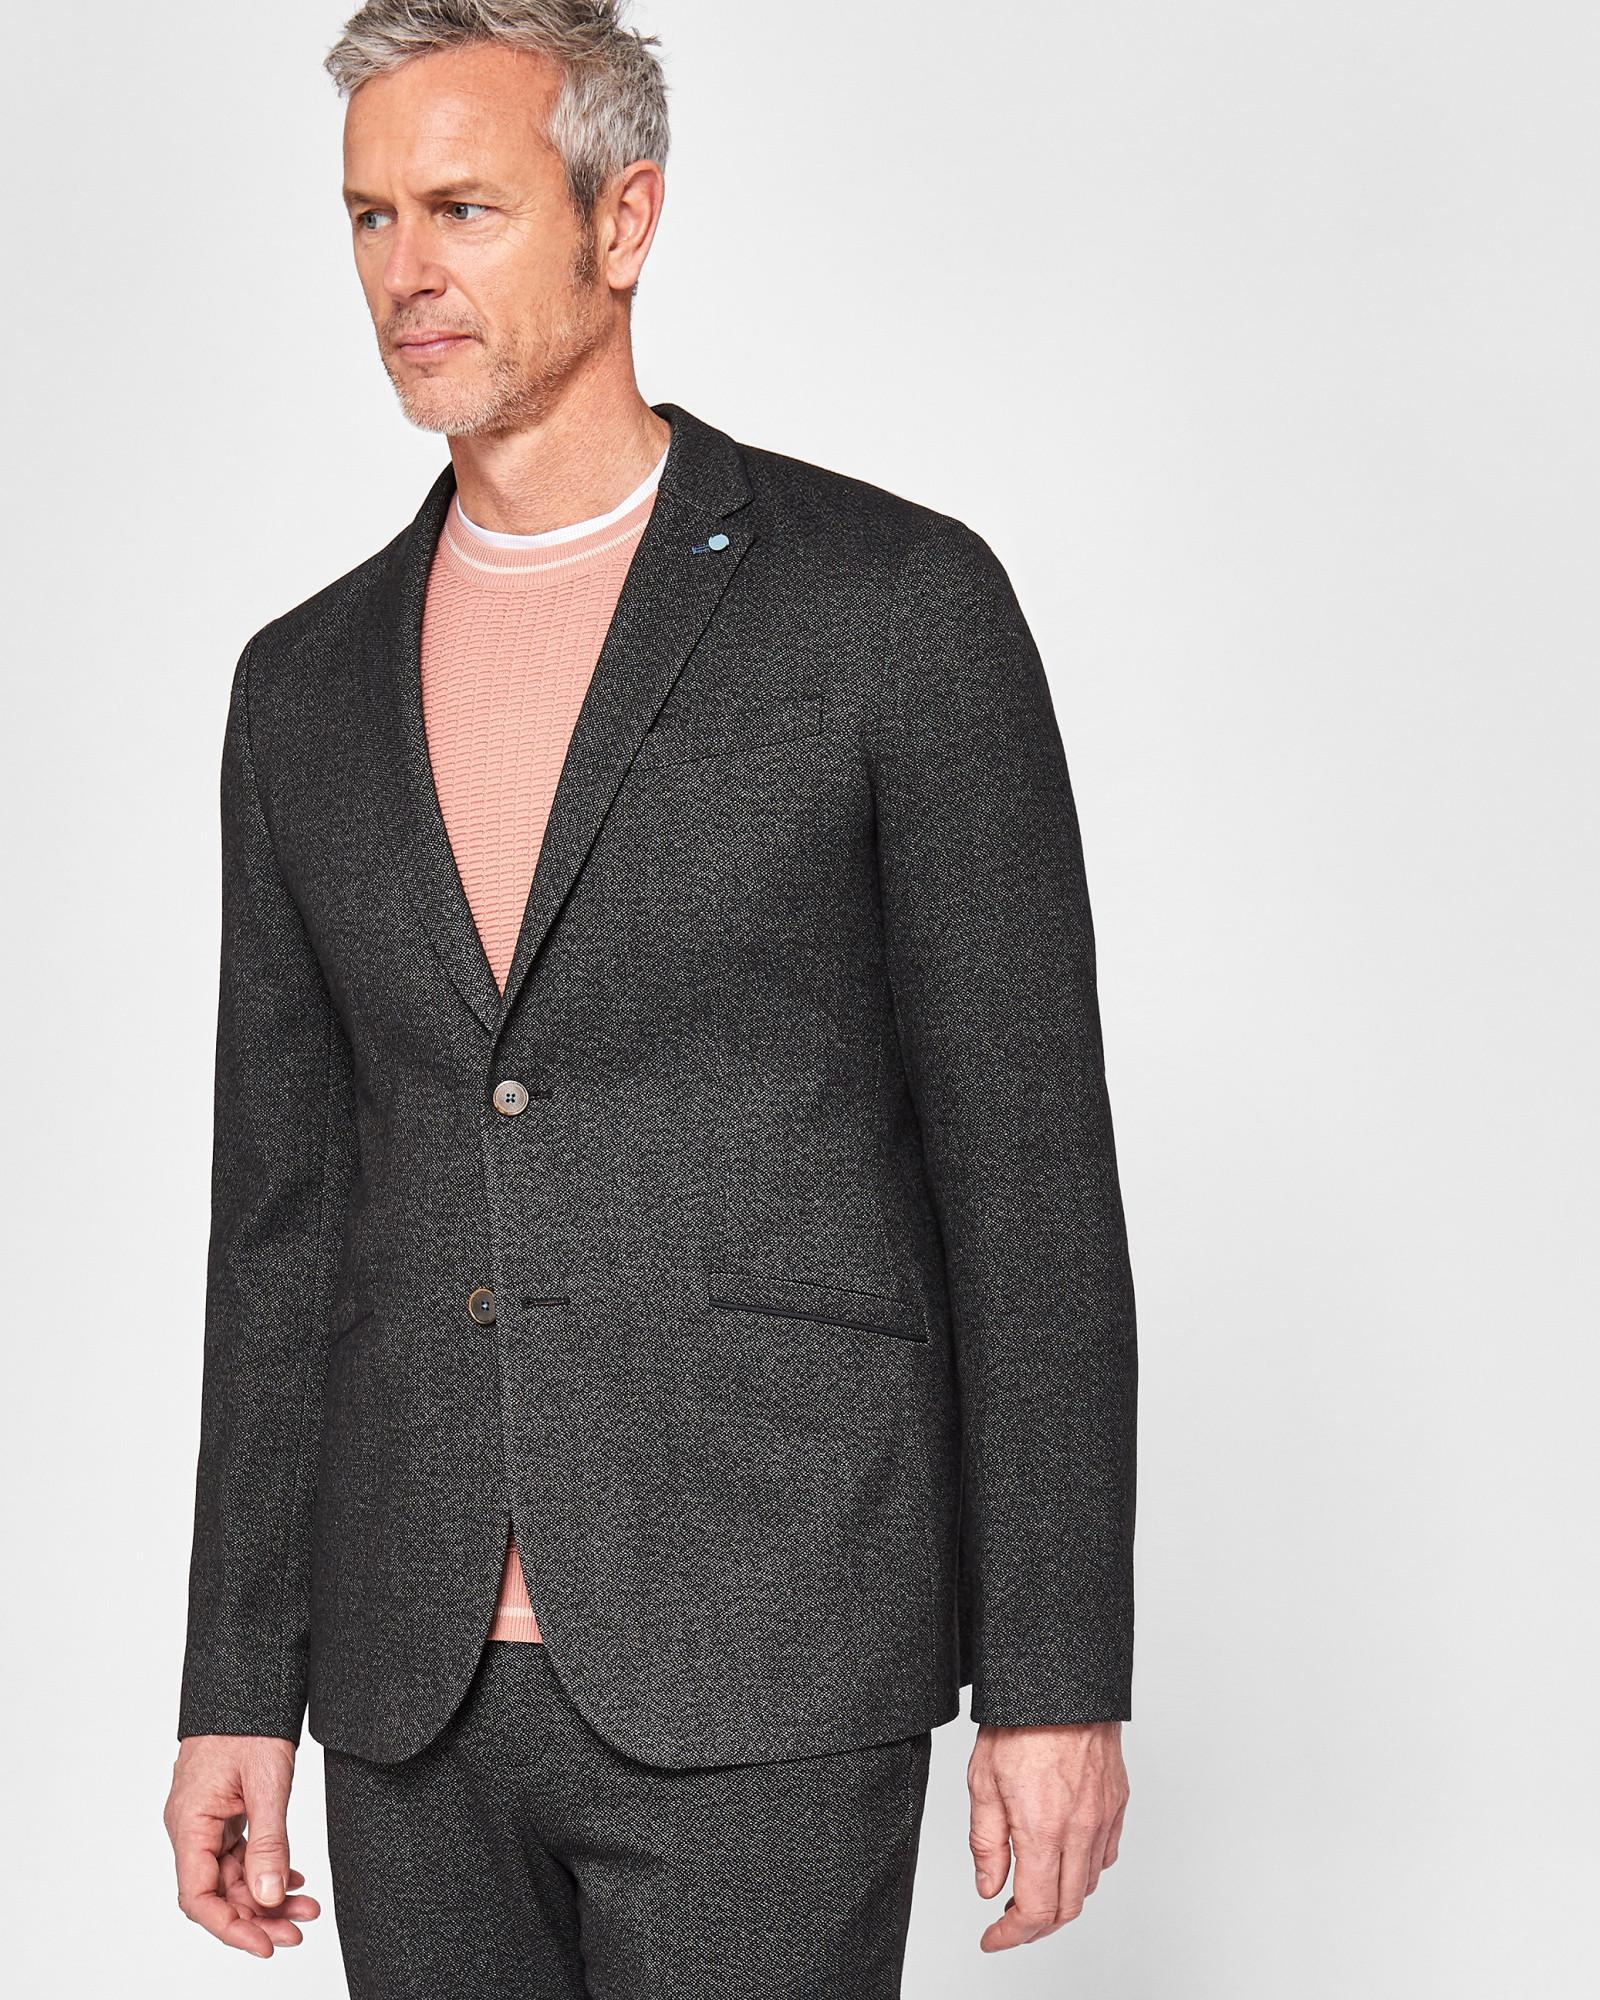 8c2985146 Ted Baker Tall Semi Plain Jacket in Gray for Men - Lyst